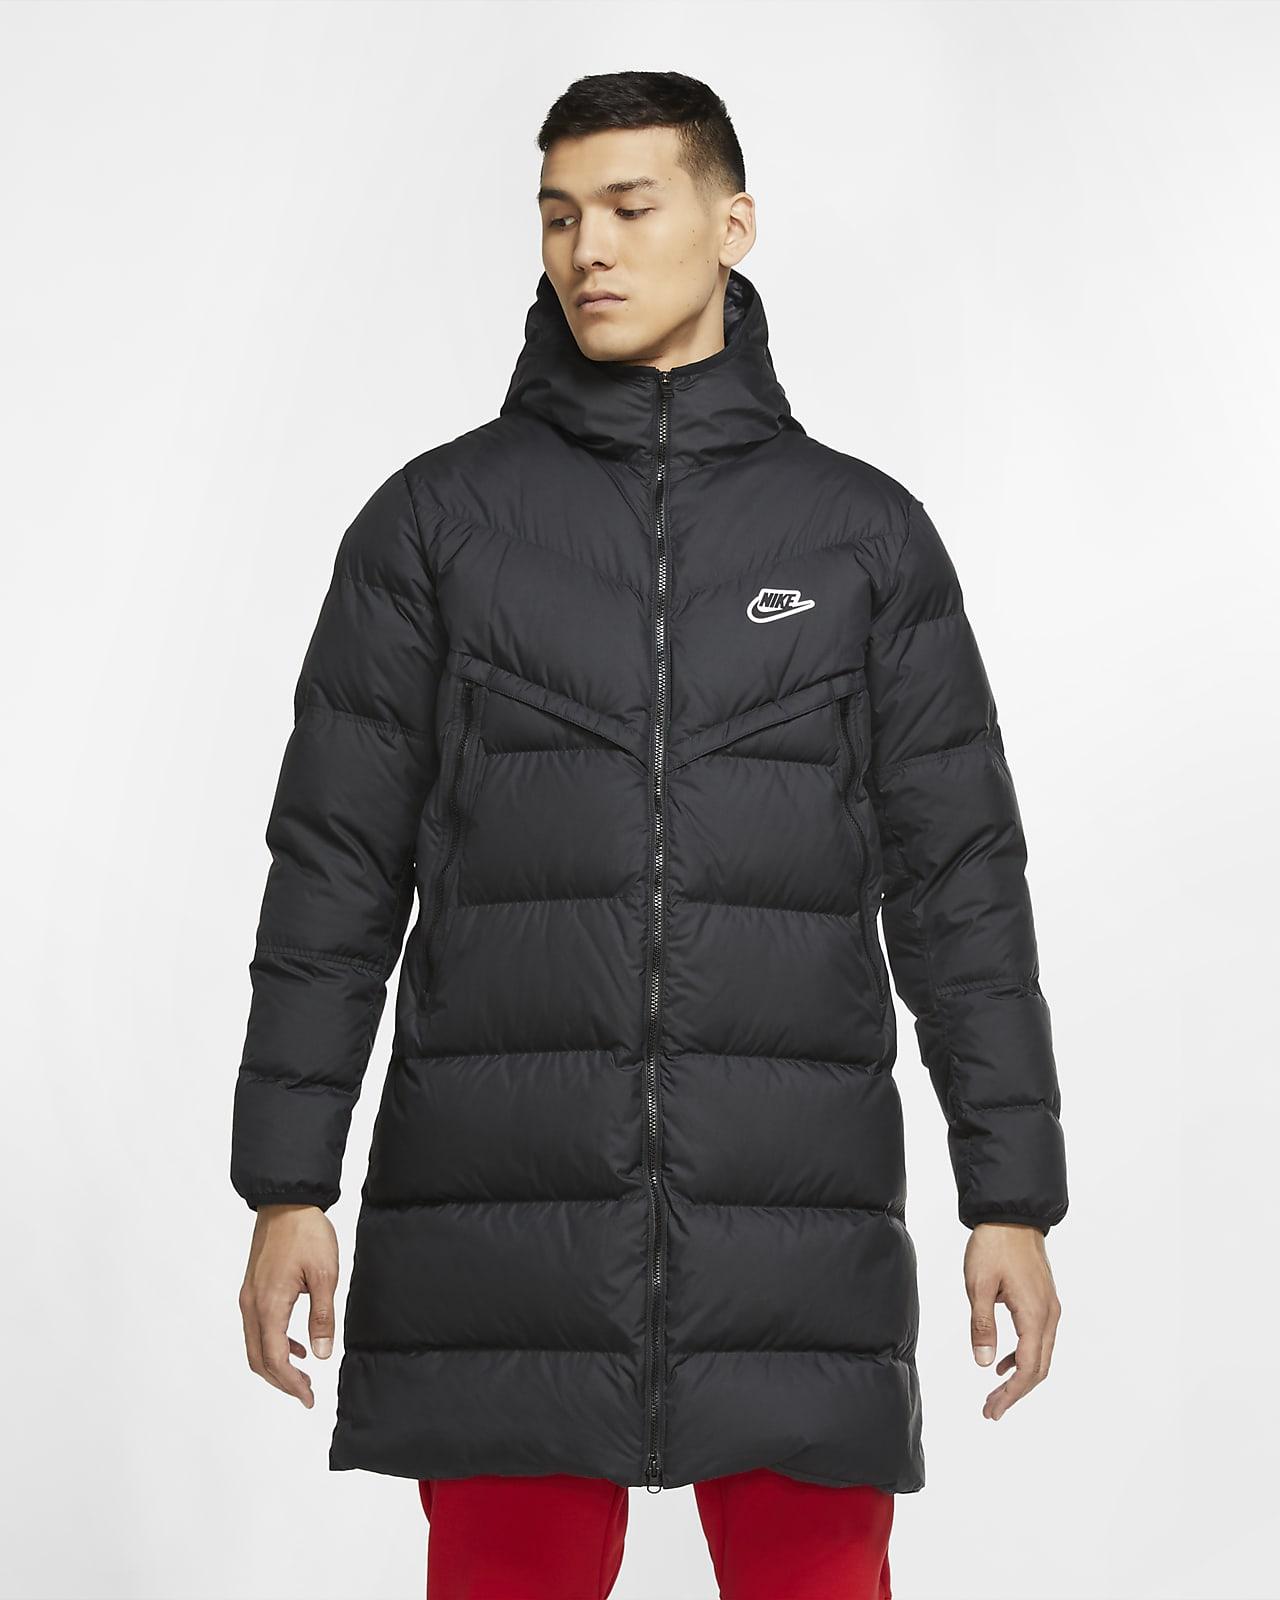 Nike Sportswear Down-Fill Windrunner időjárásálló férfiparka